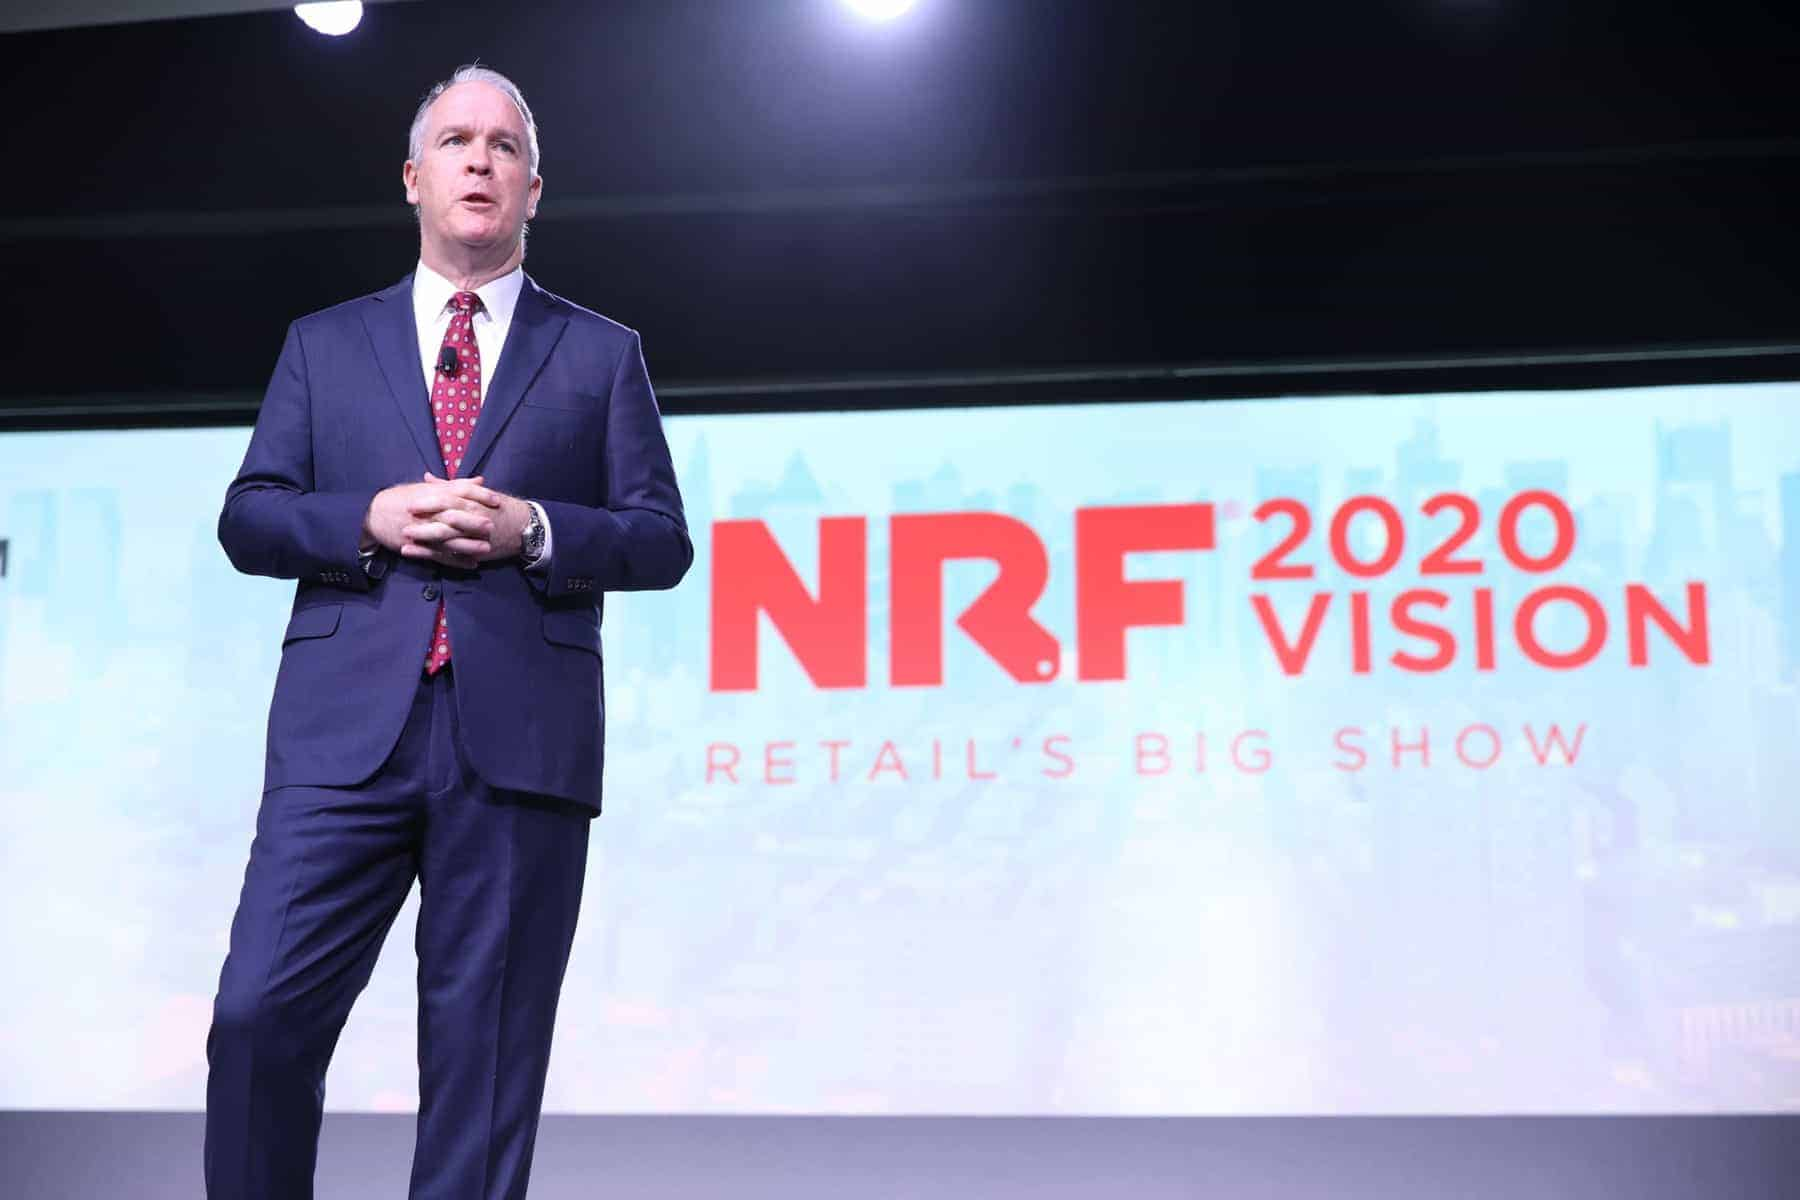 NRF 2020 Vision